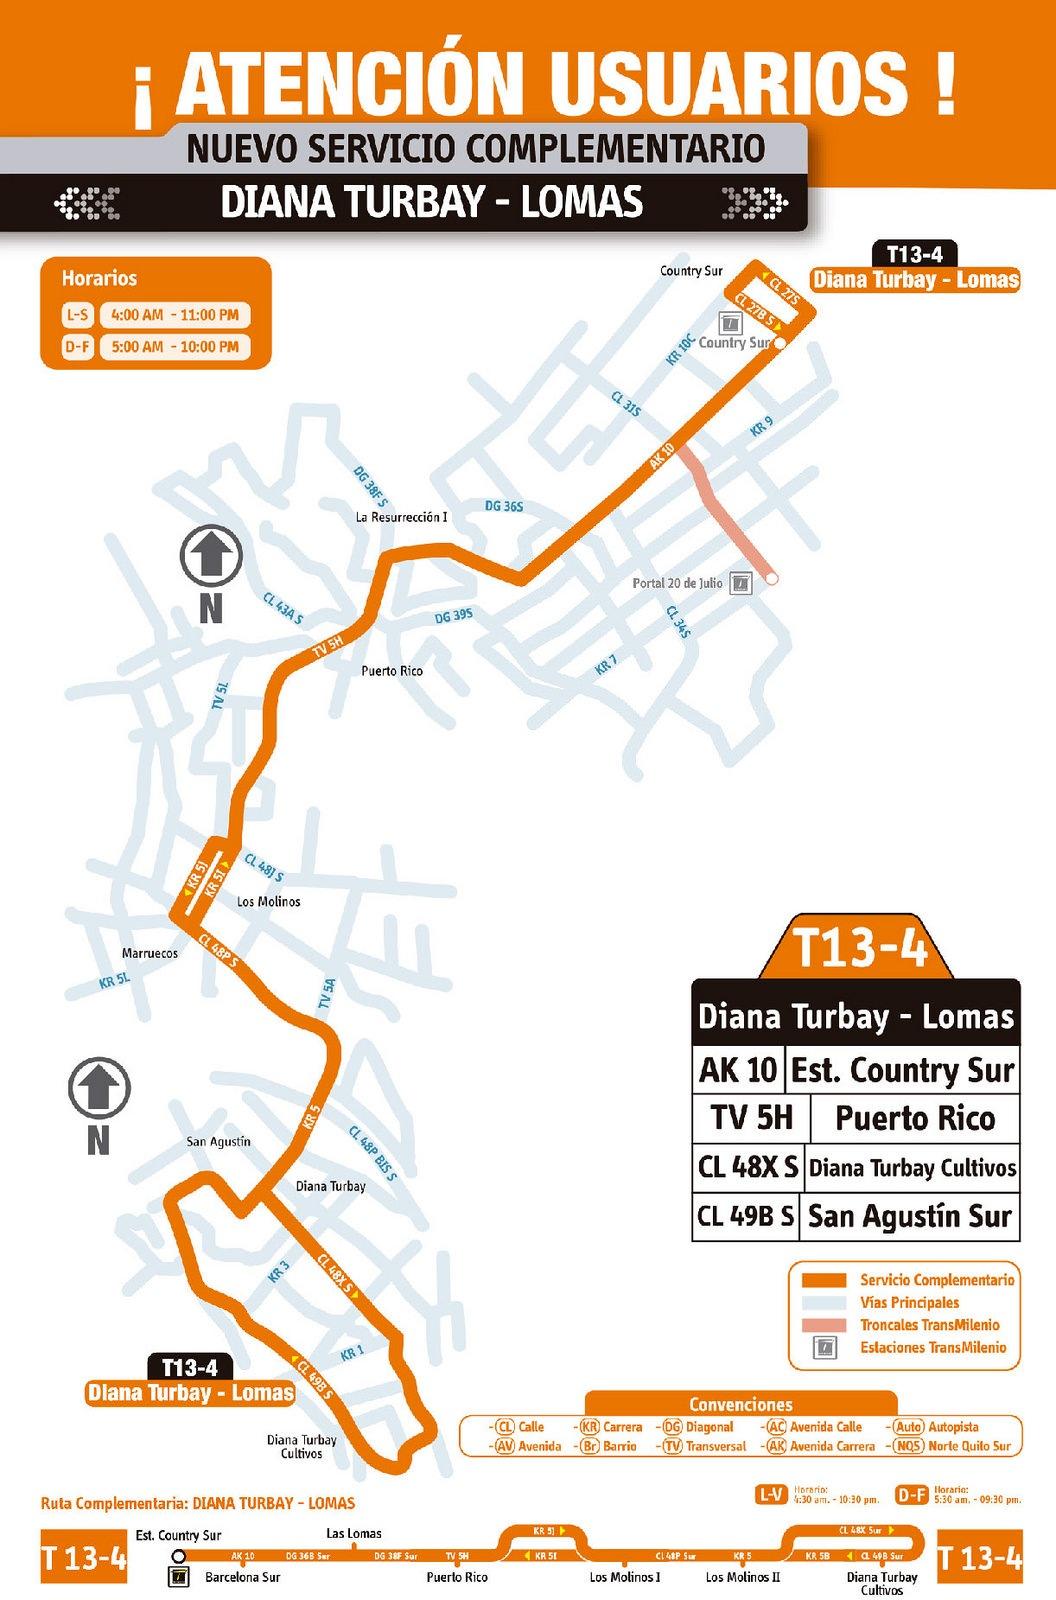 Ruta SITP: T13-4 Diana Turbay - Lomas [Complementaria] 4